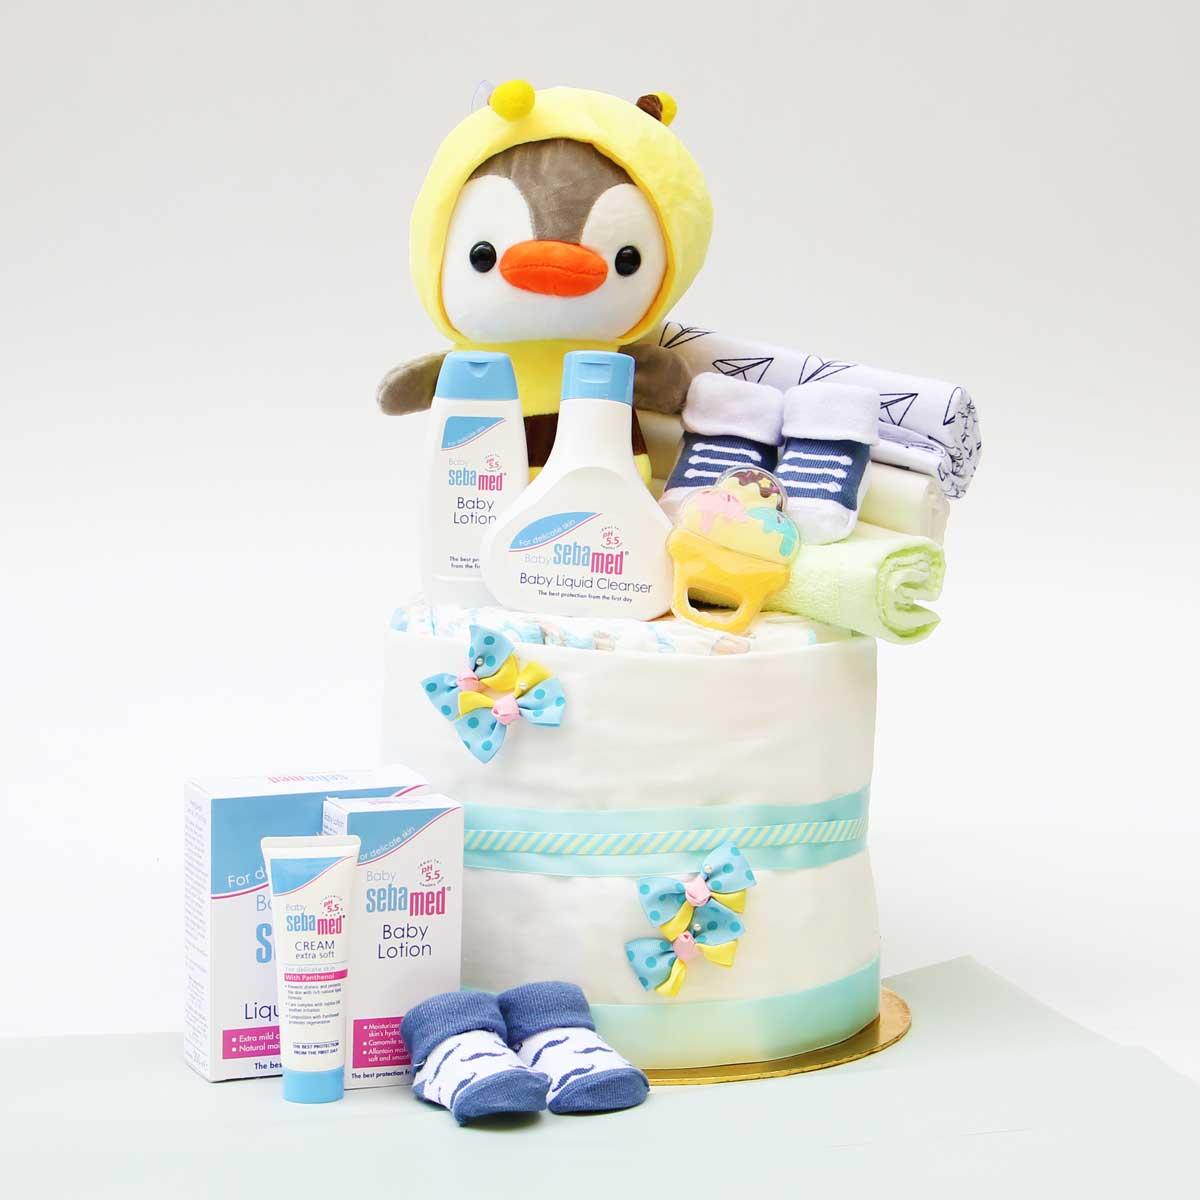 Sebamed Baby Bath Diaper Cake | Newborn Baby Gifts | Eska Creative Gifting